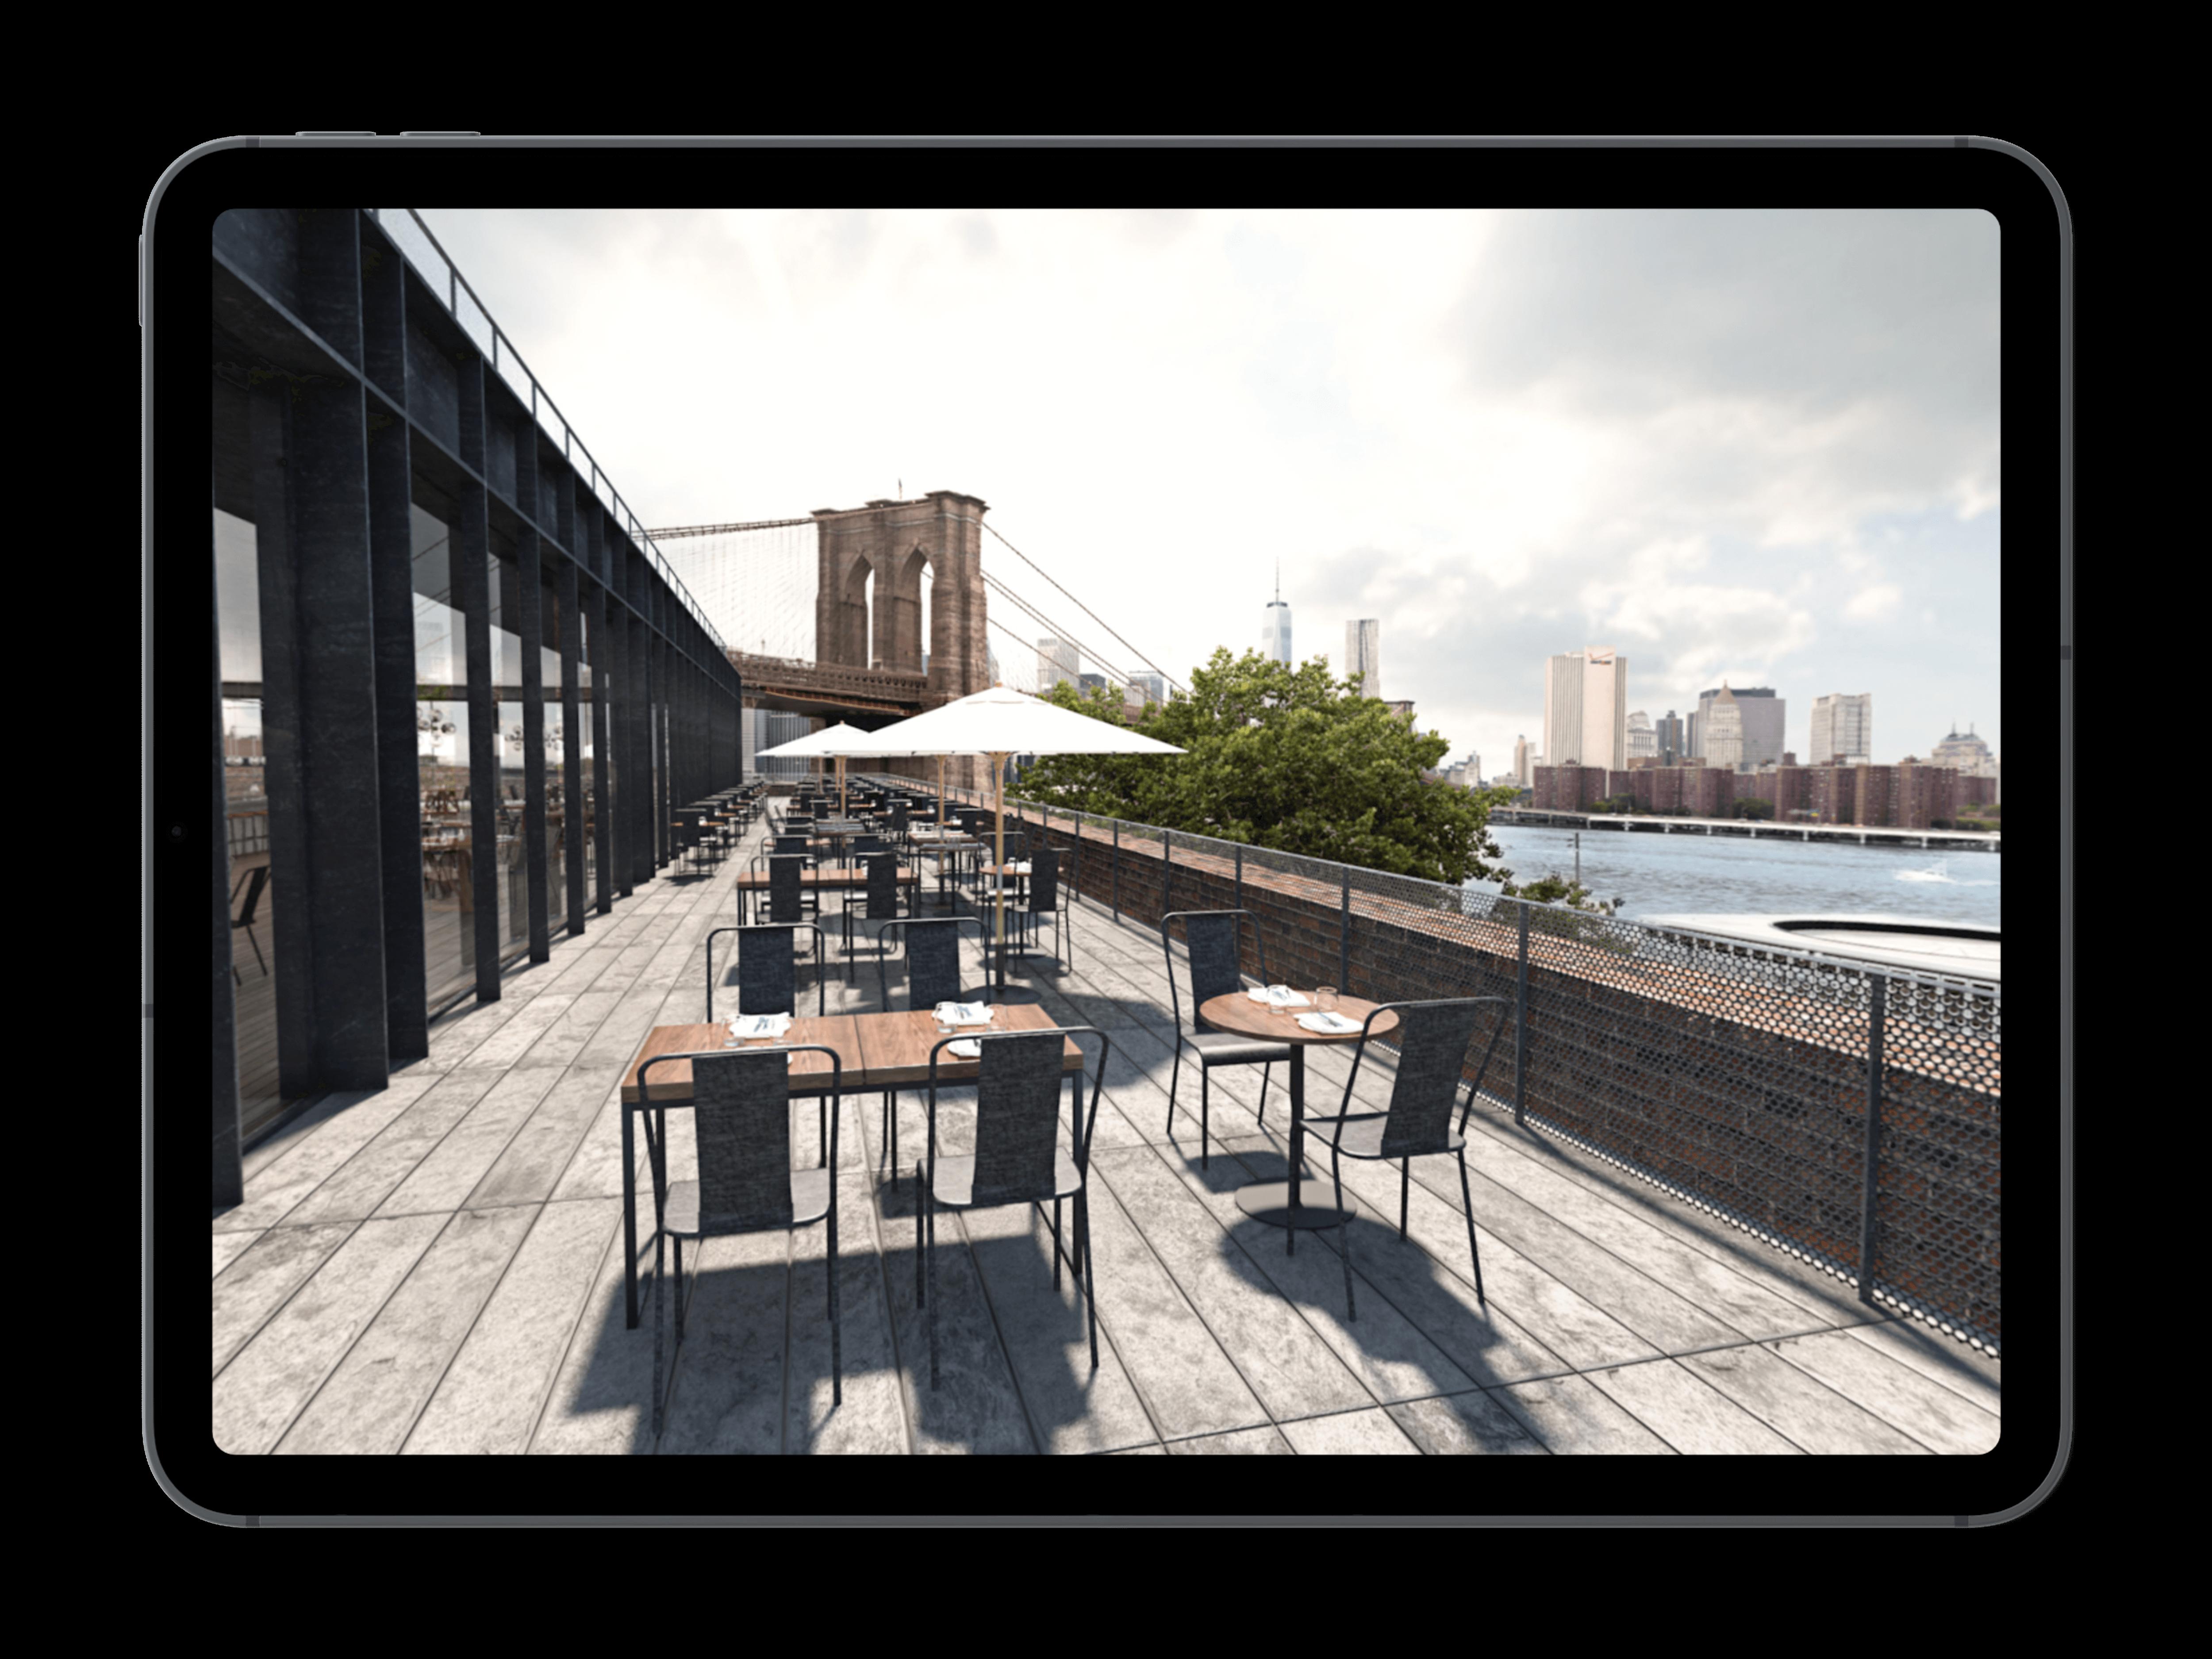 Empire-Stores_Rooftop-Exterior_v001